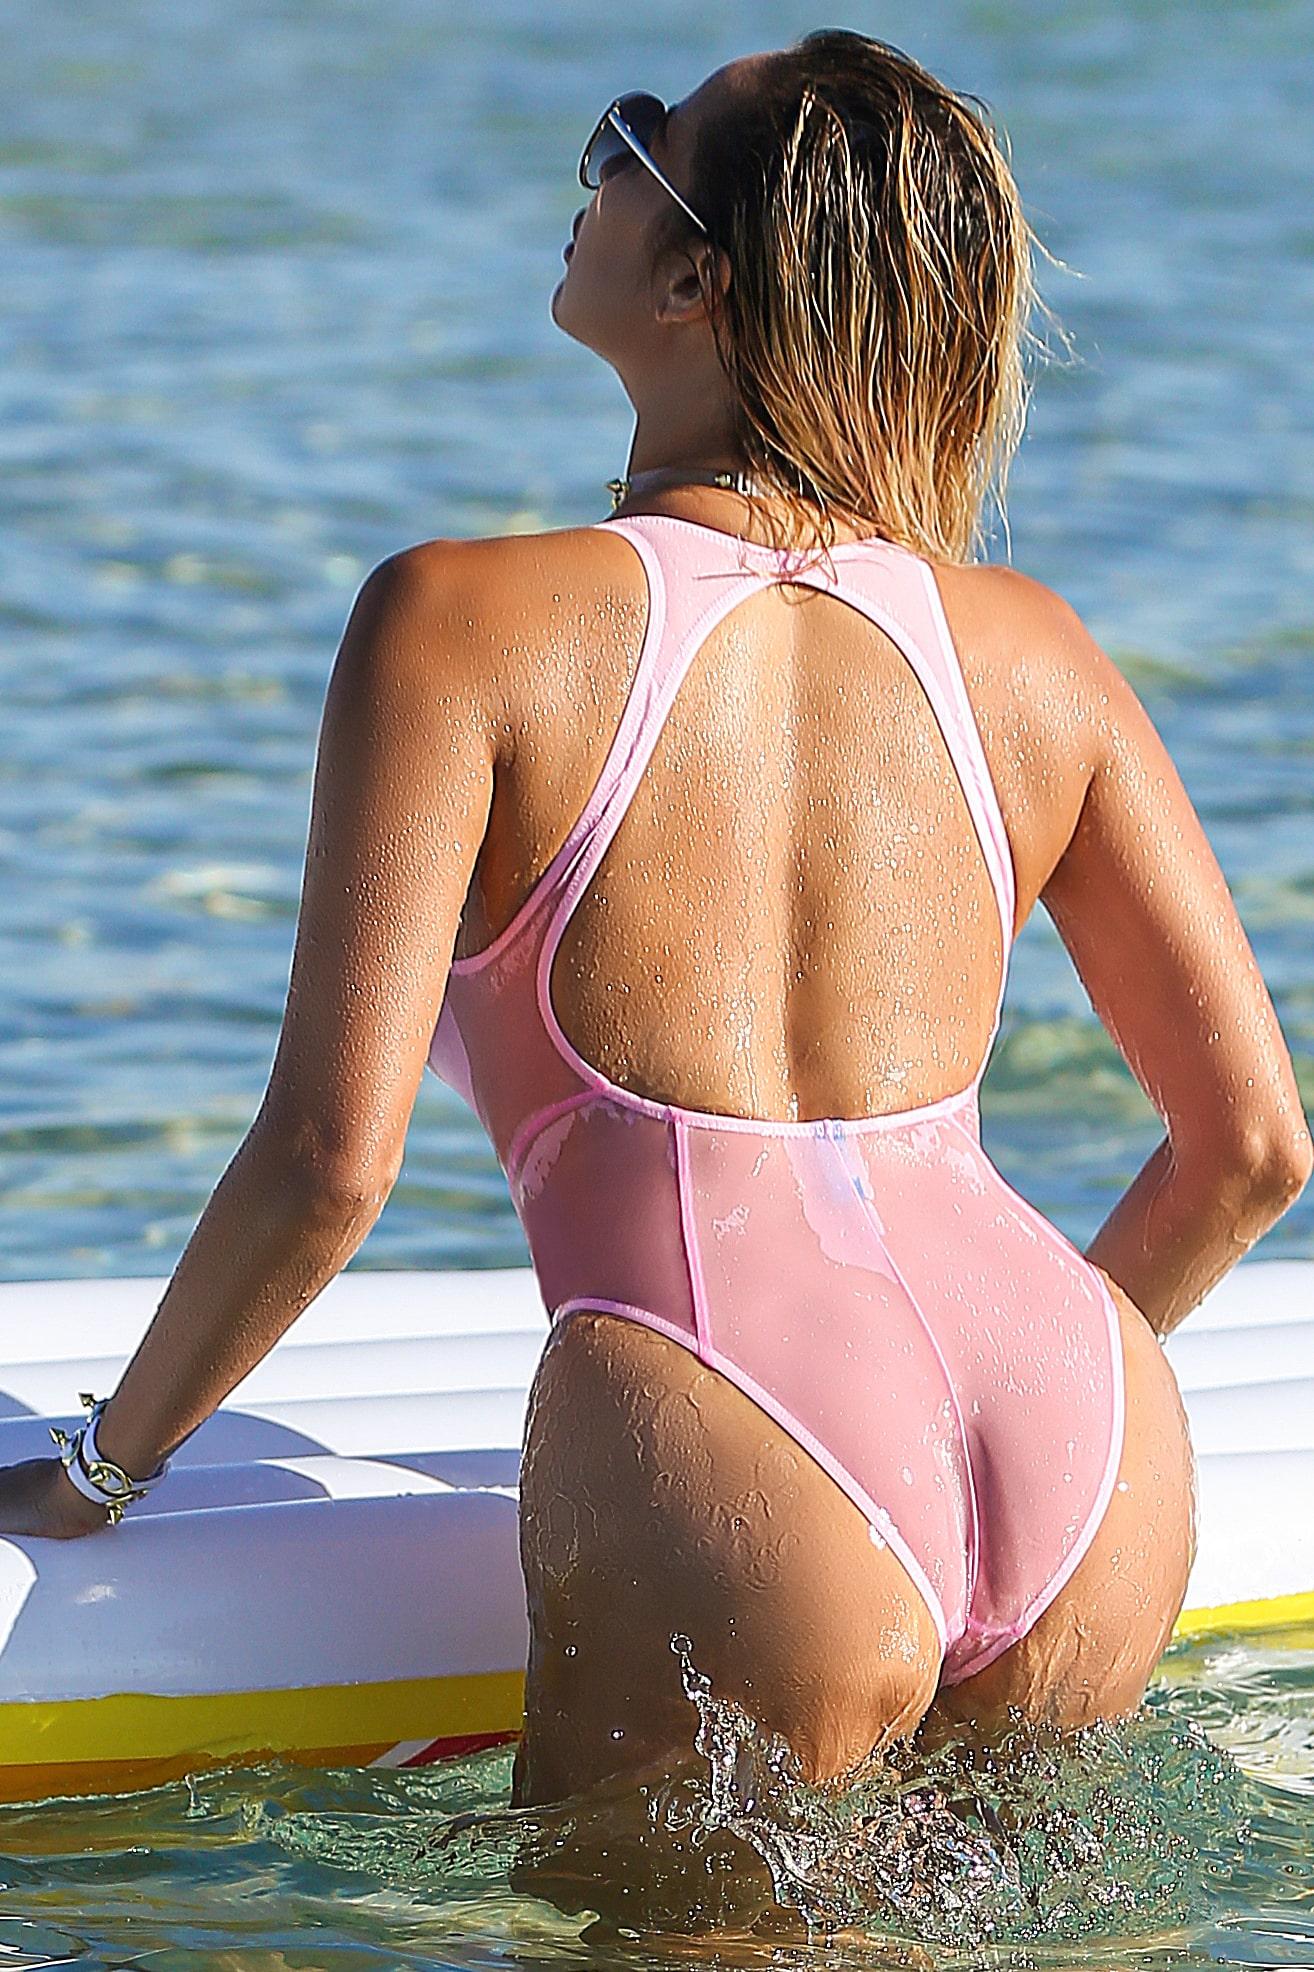 Sheer when wet one piece pink swimsuit. Cute women rave bodysuit. Sexy see through high waist designer swimwear. Hot high cut leg monokini.